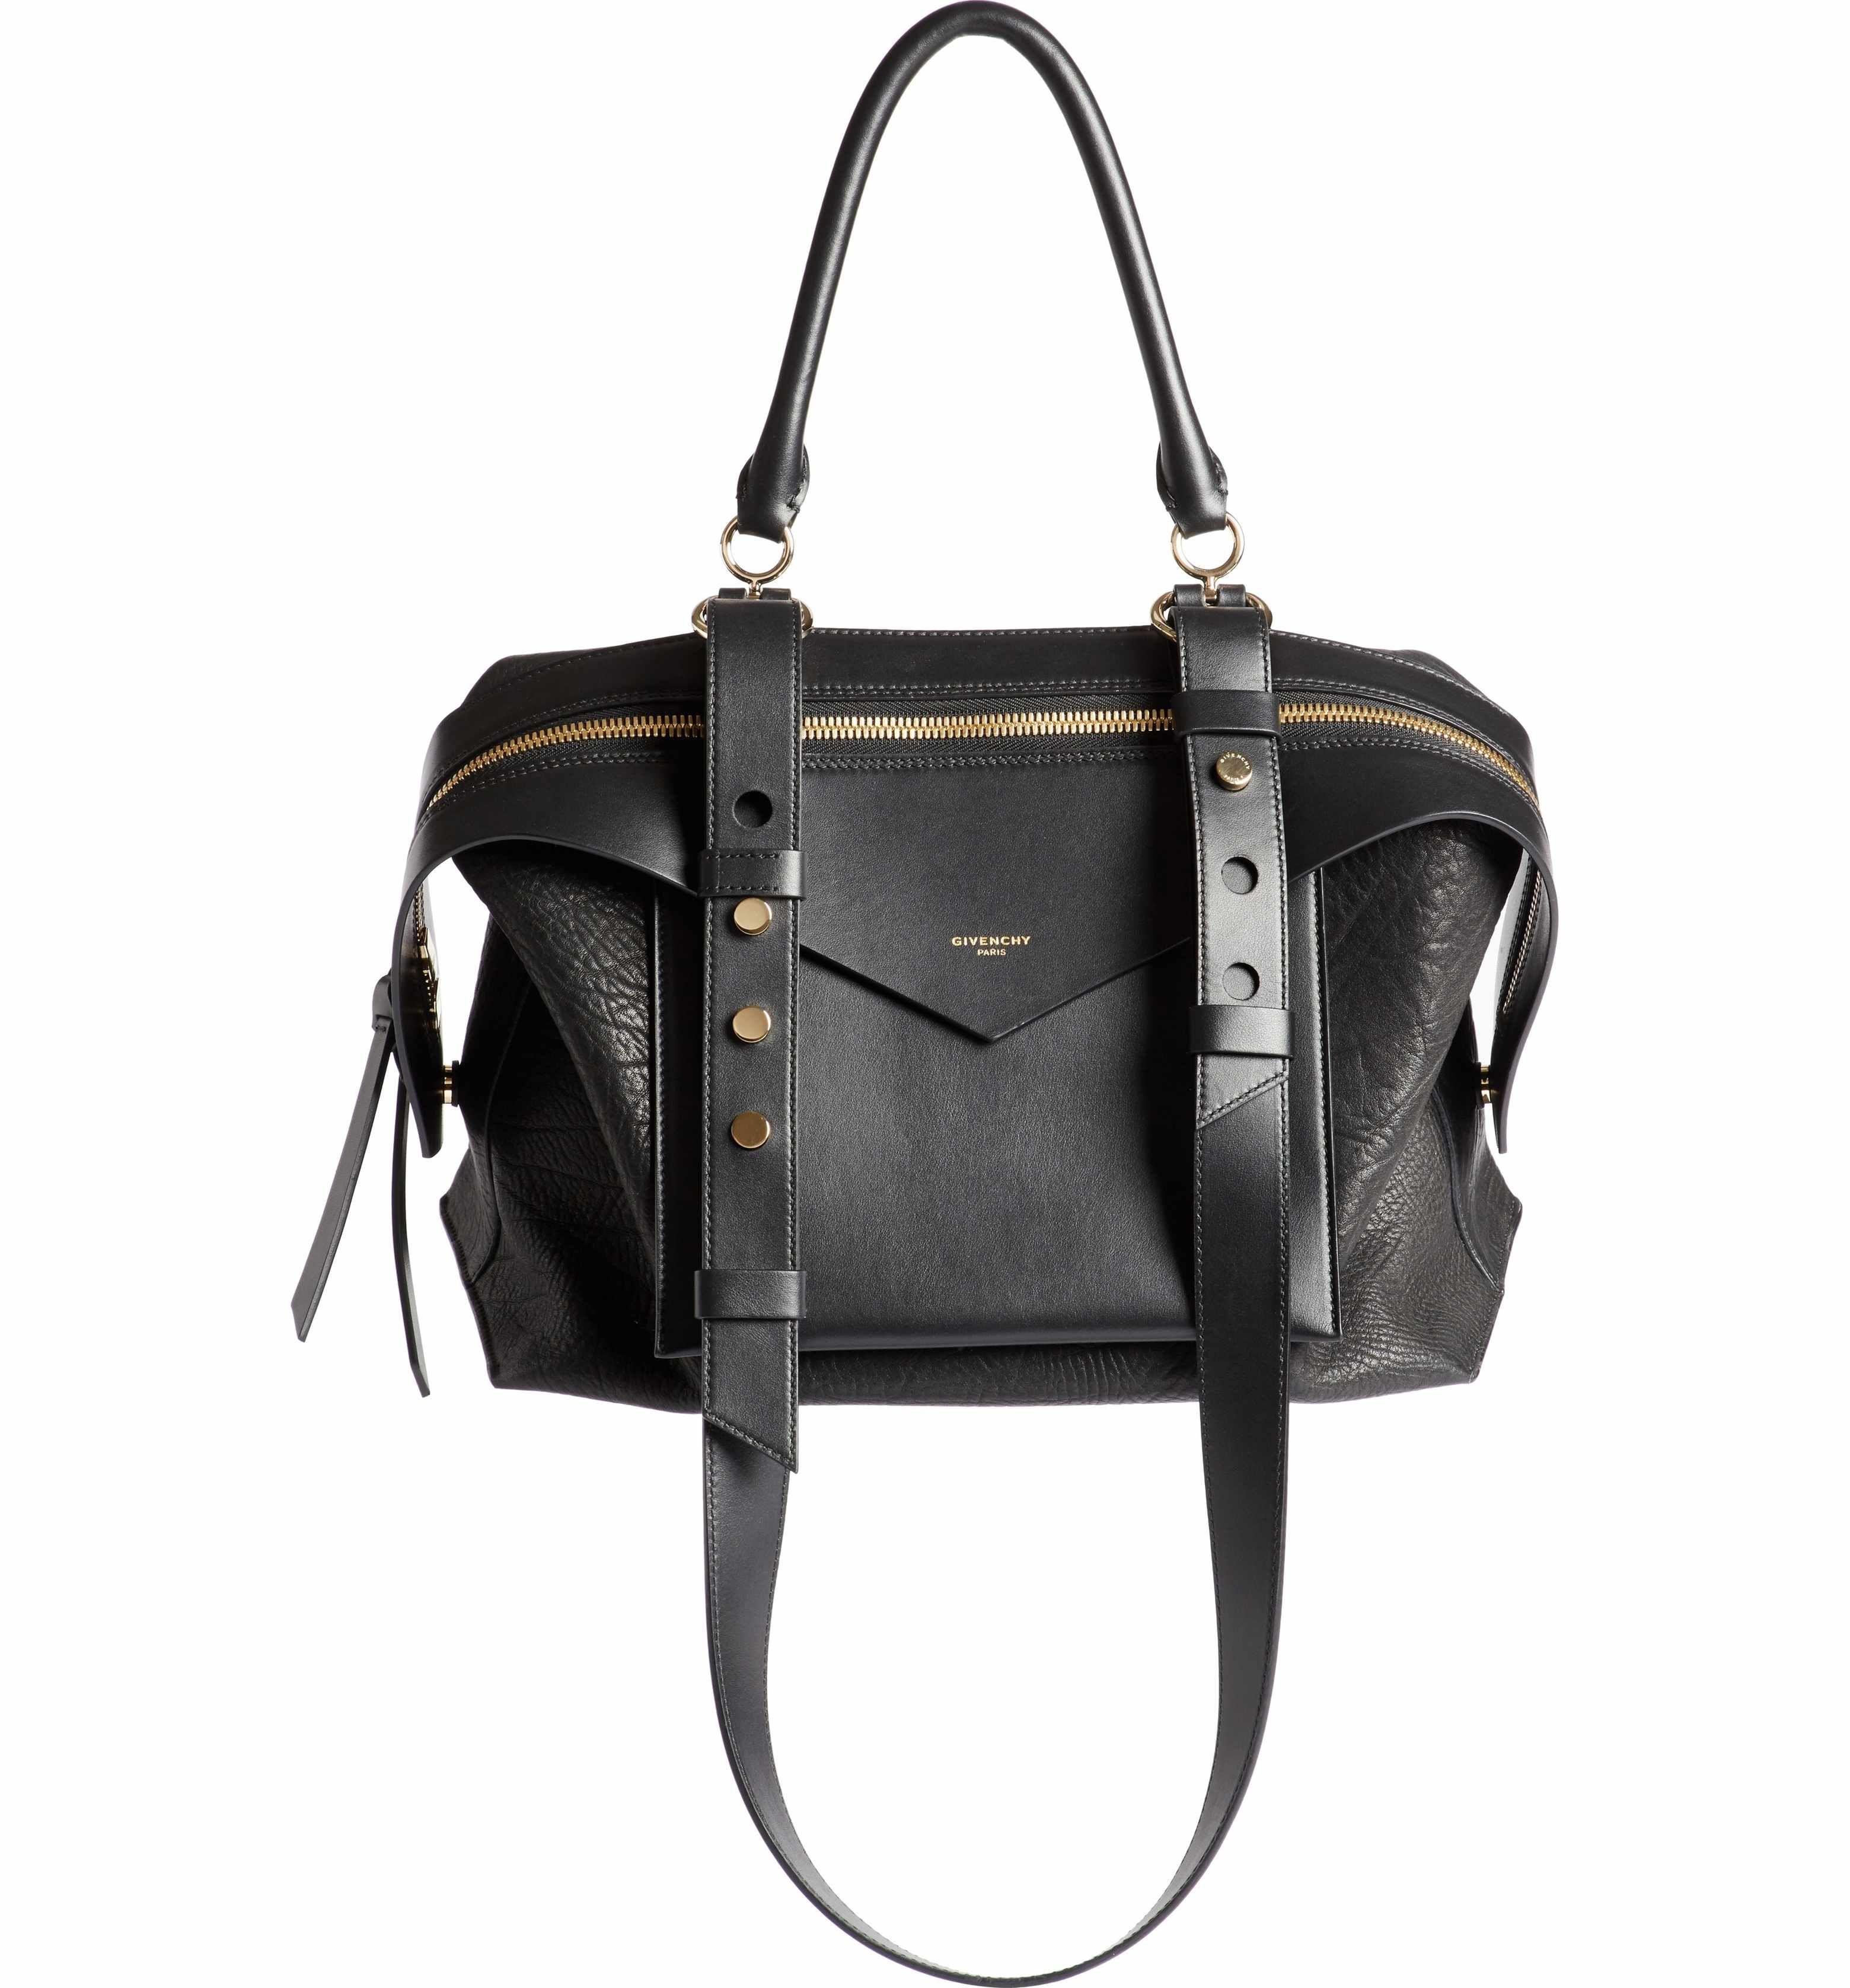 bf9e56d2595 Main Image - Givenchy Medium Sway Leather Satchel   Bag Swag ...